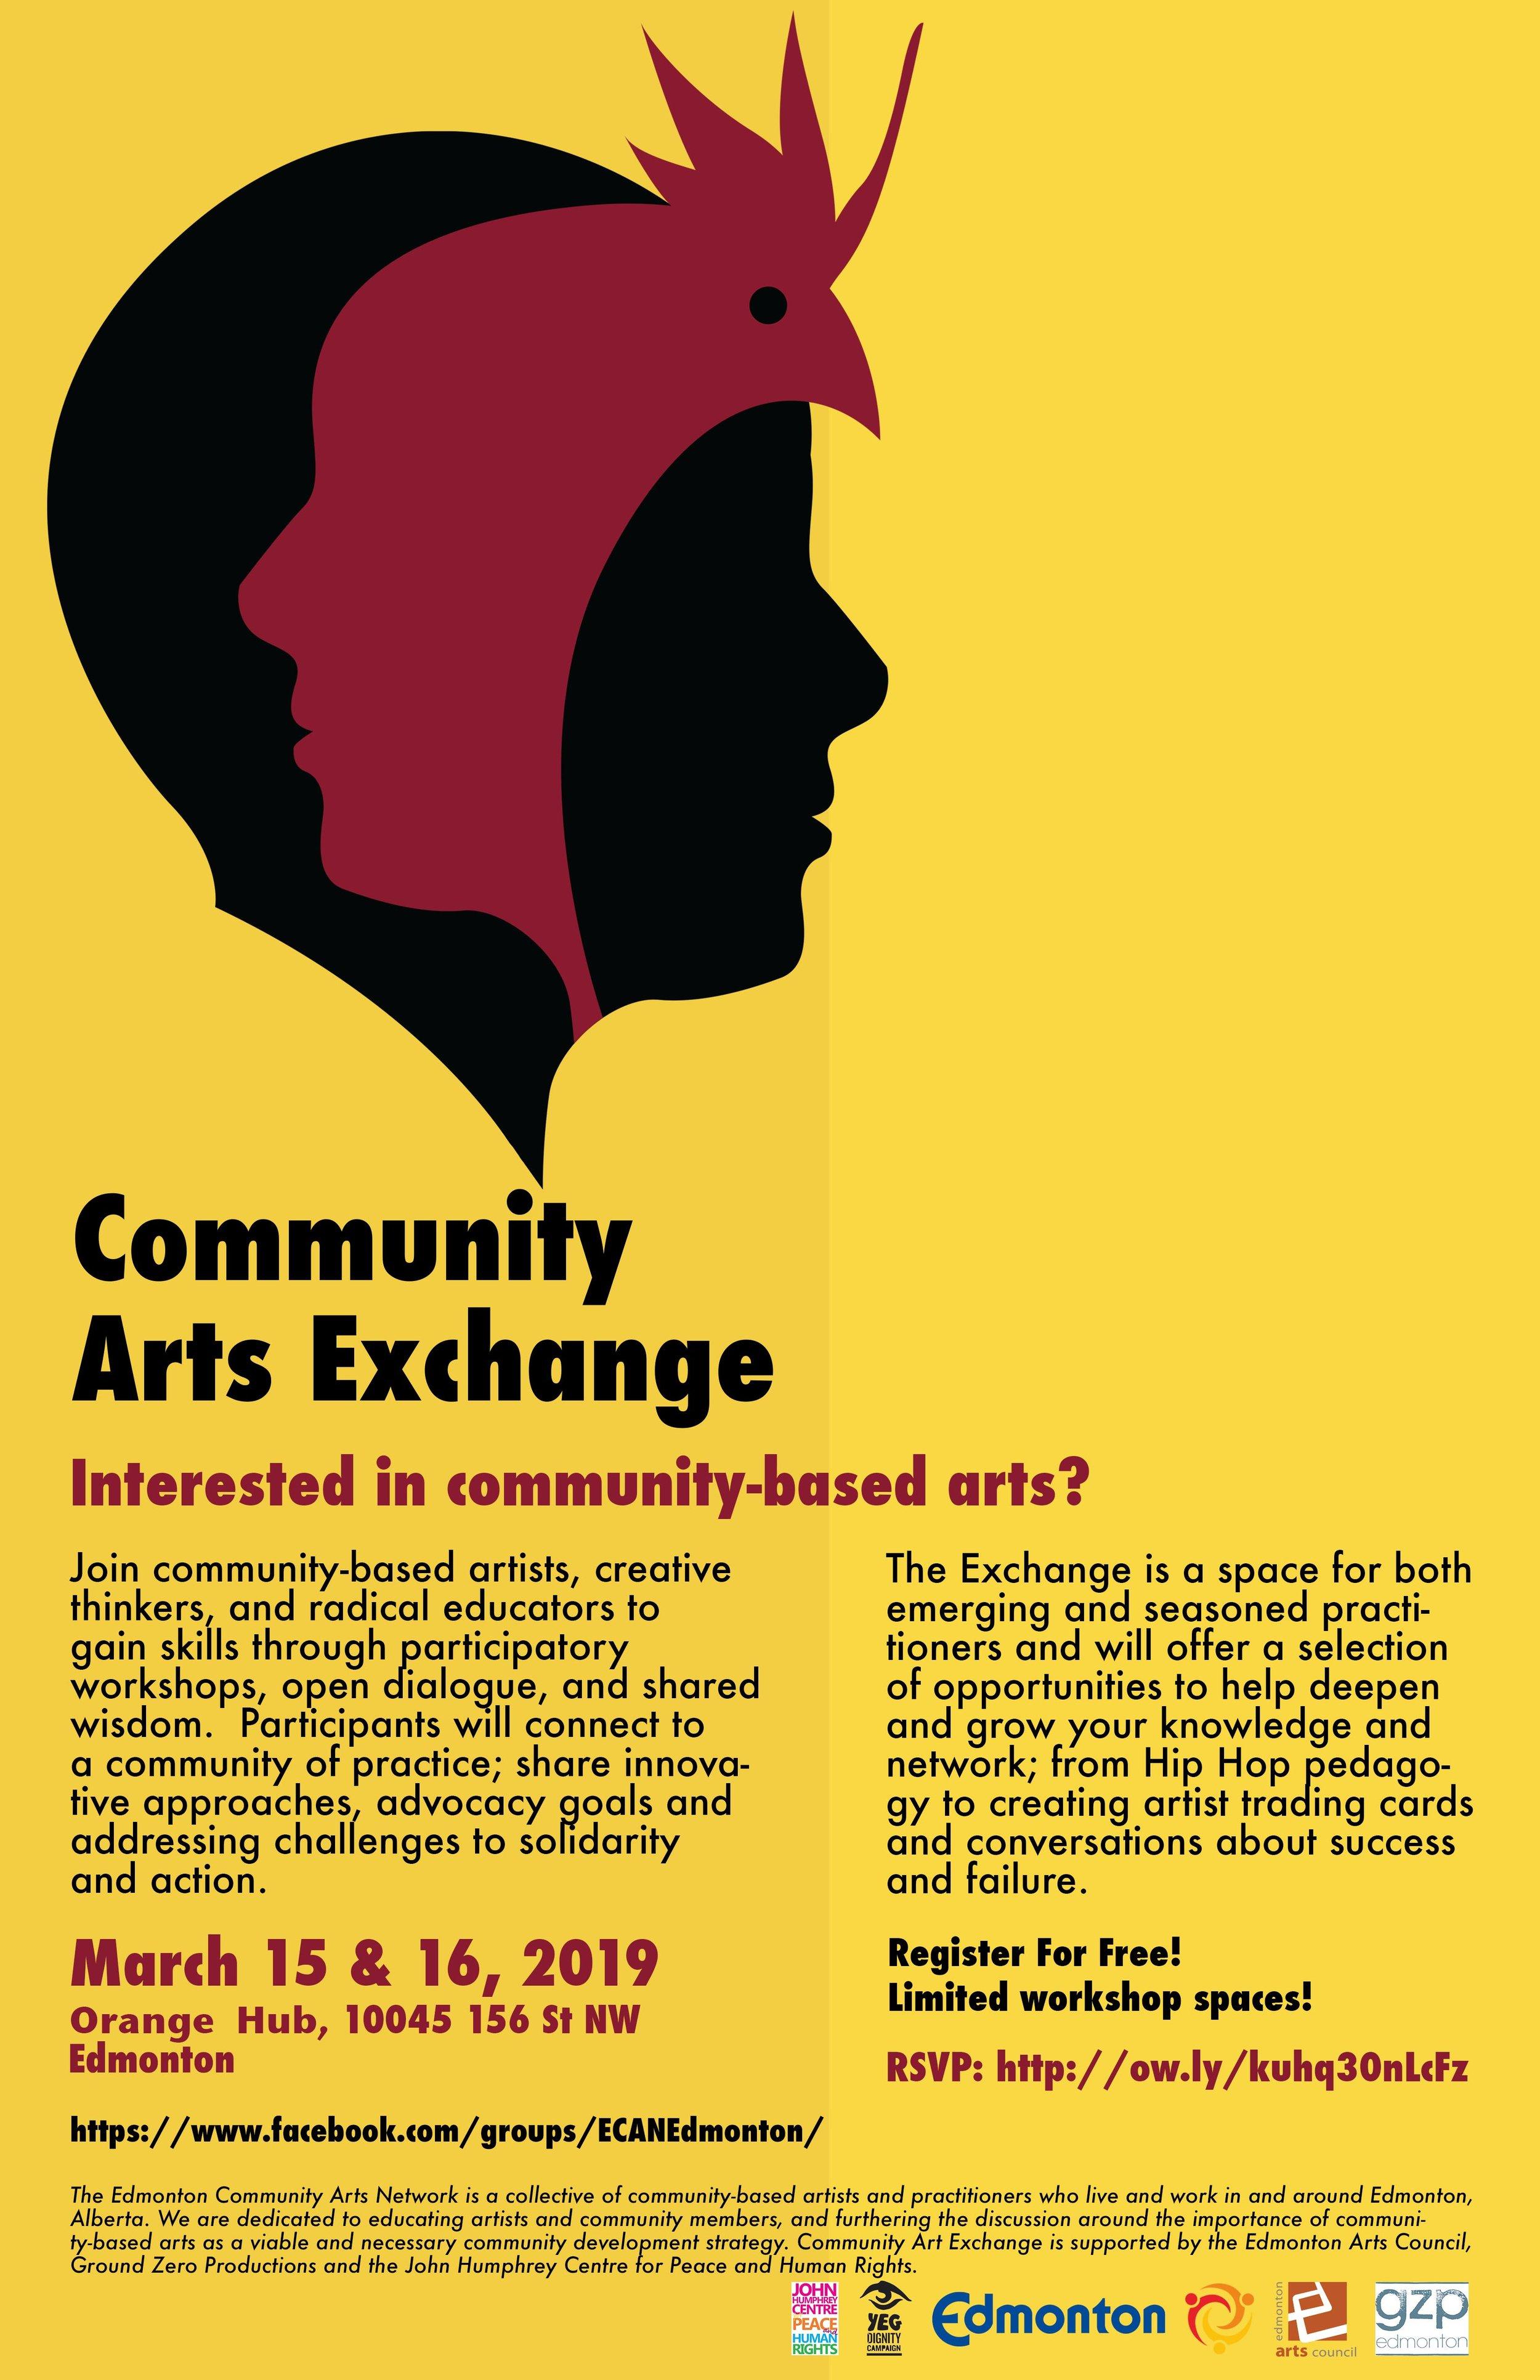 Community Arts Exchange Poster